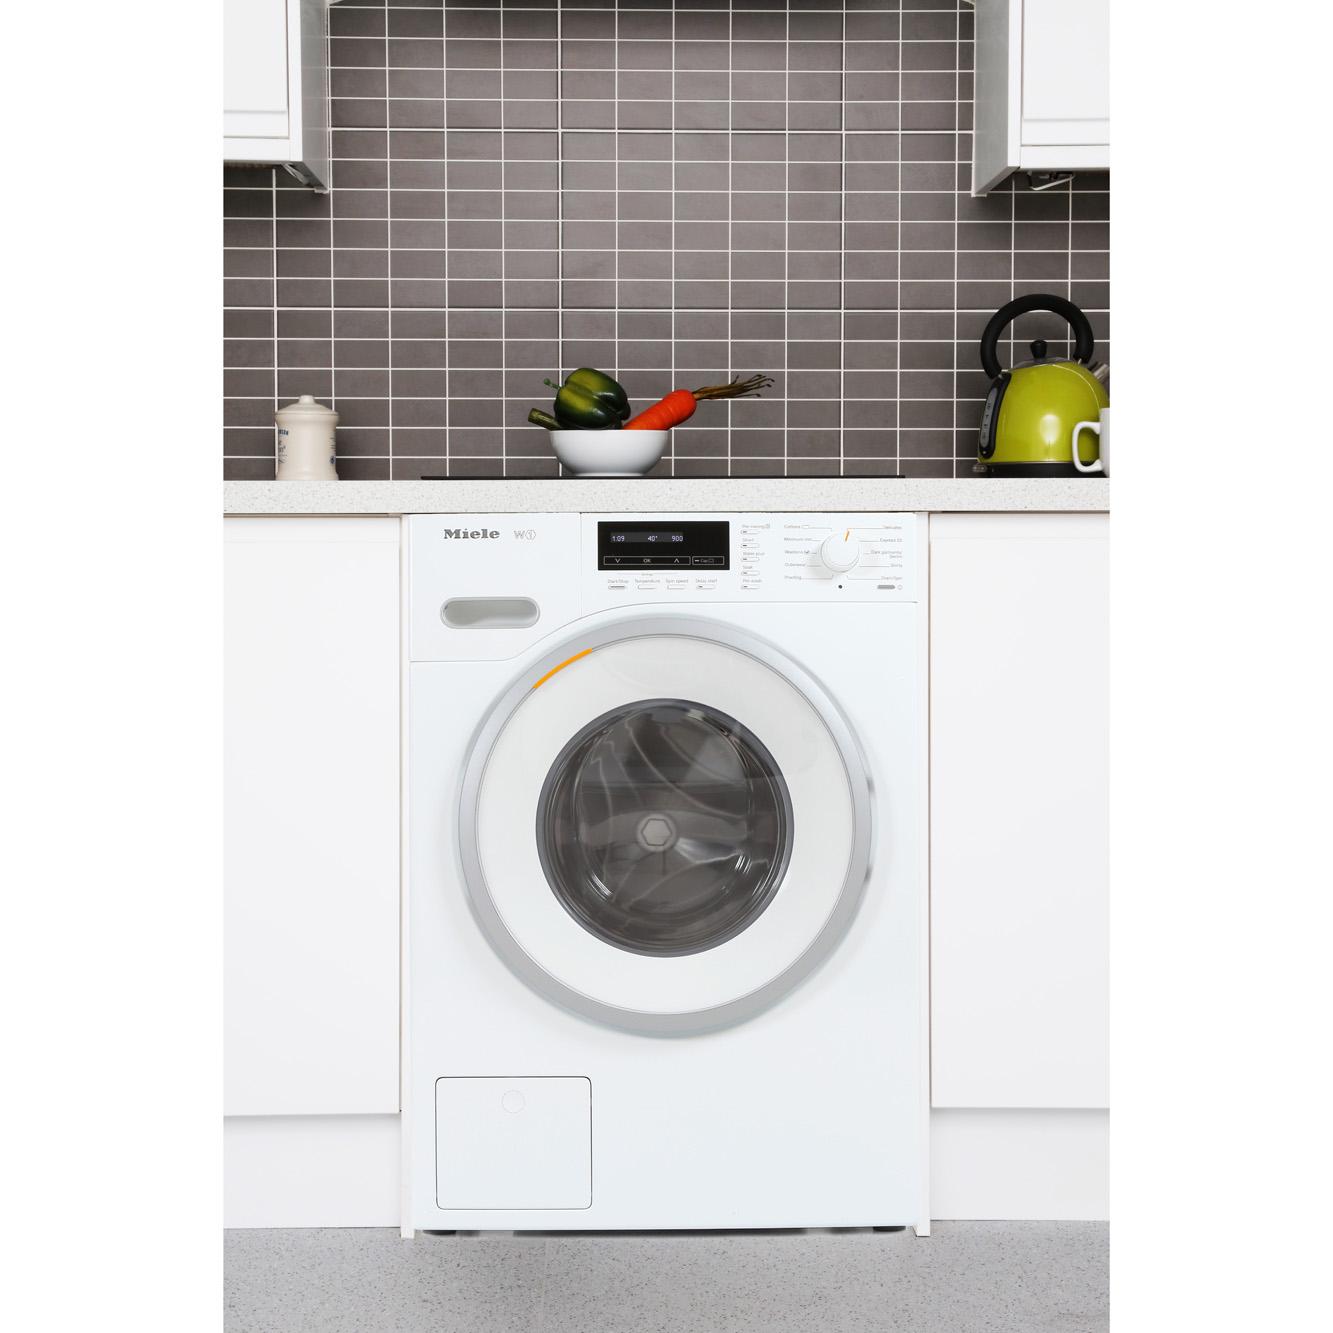 Buy Miele W1 - WhiteEdition WMB120 Washing Machine (WMB120 ...